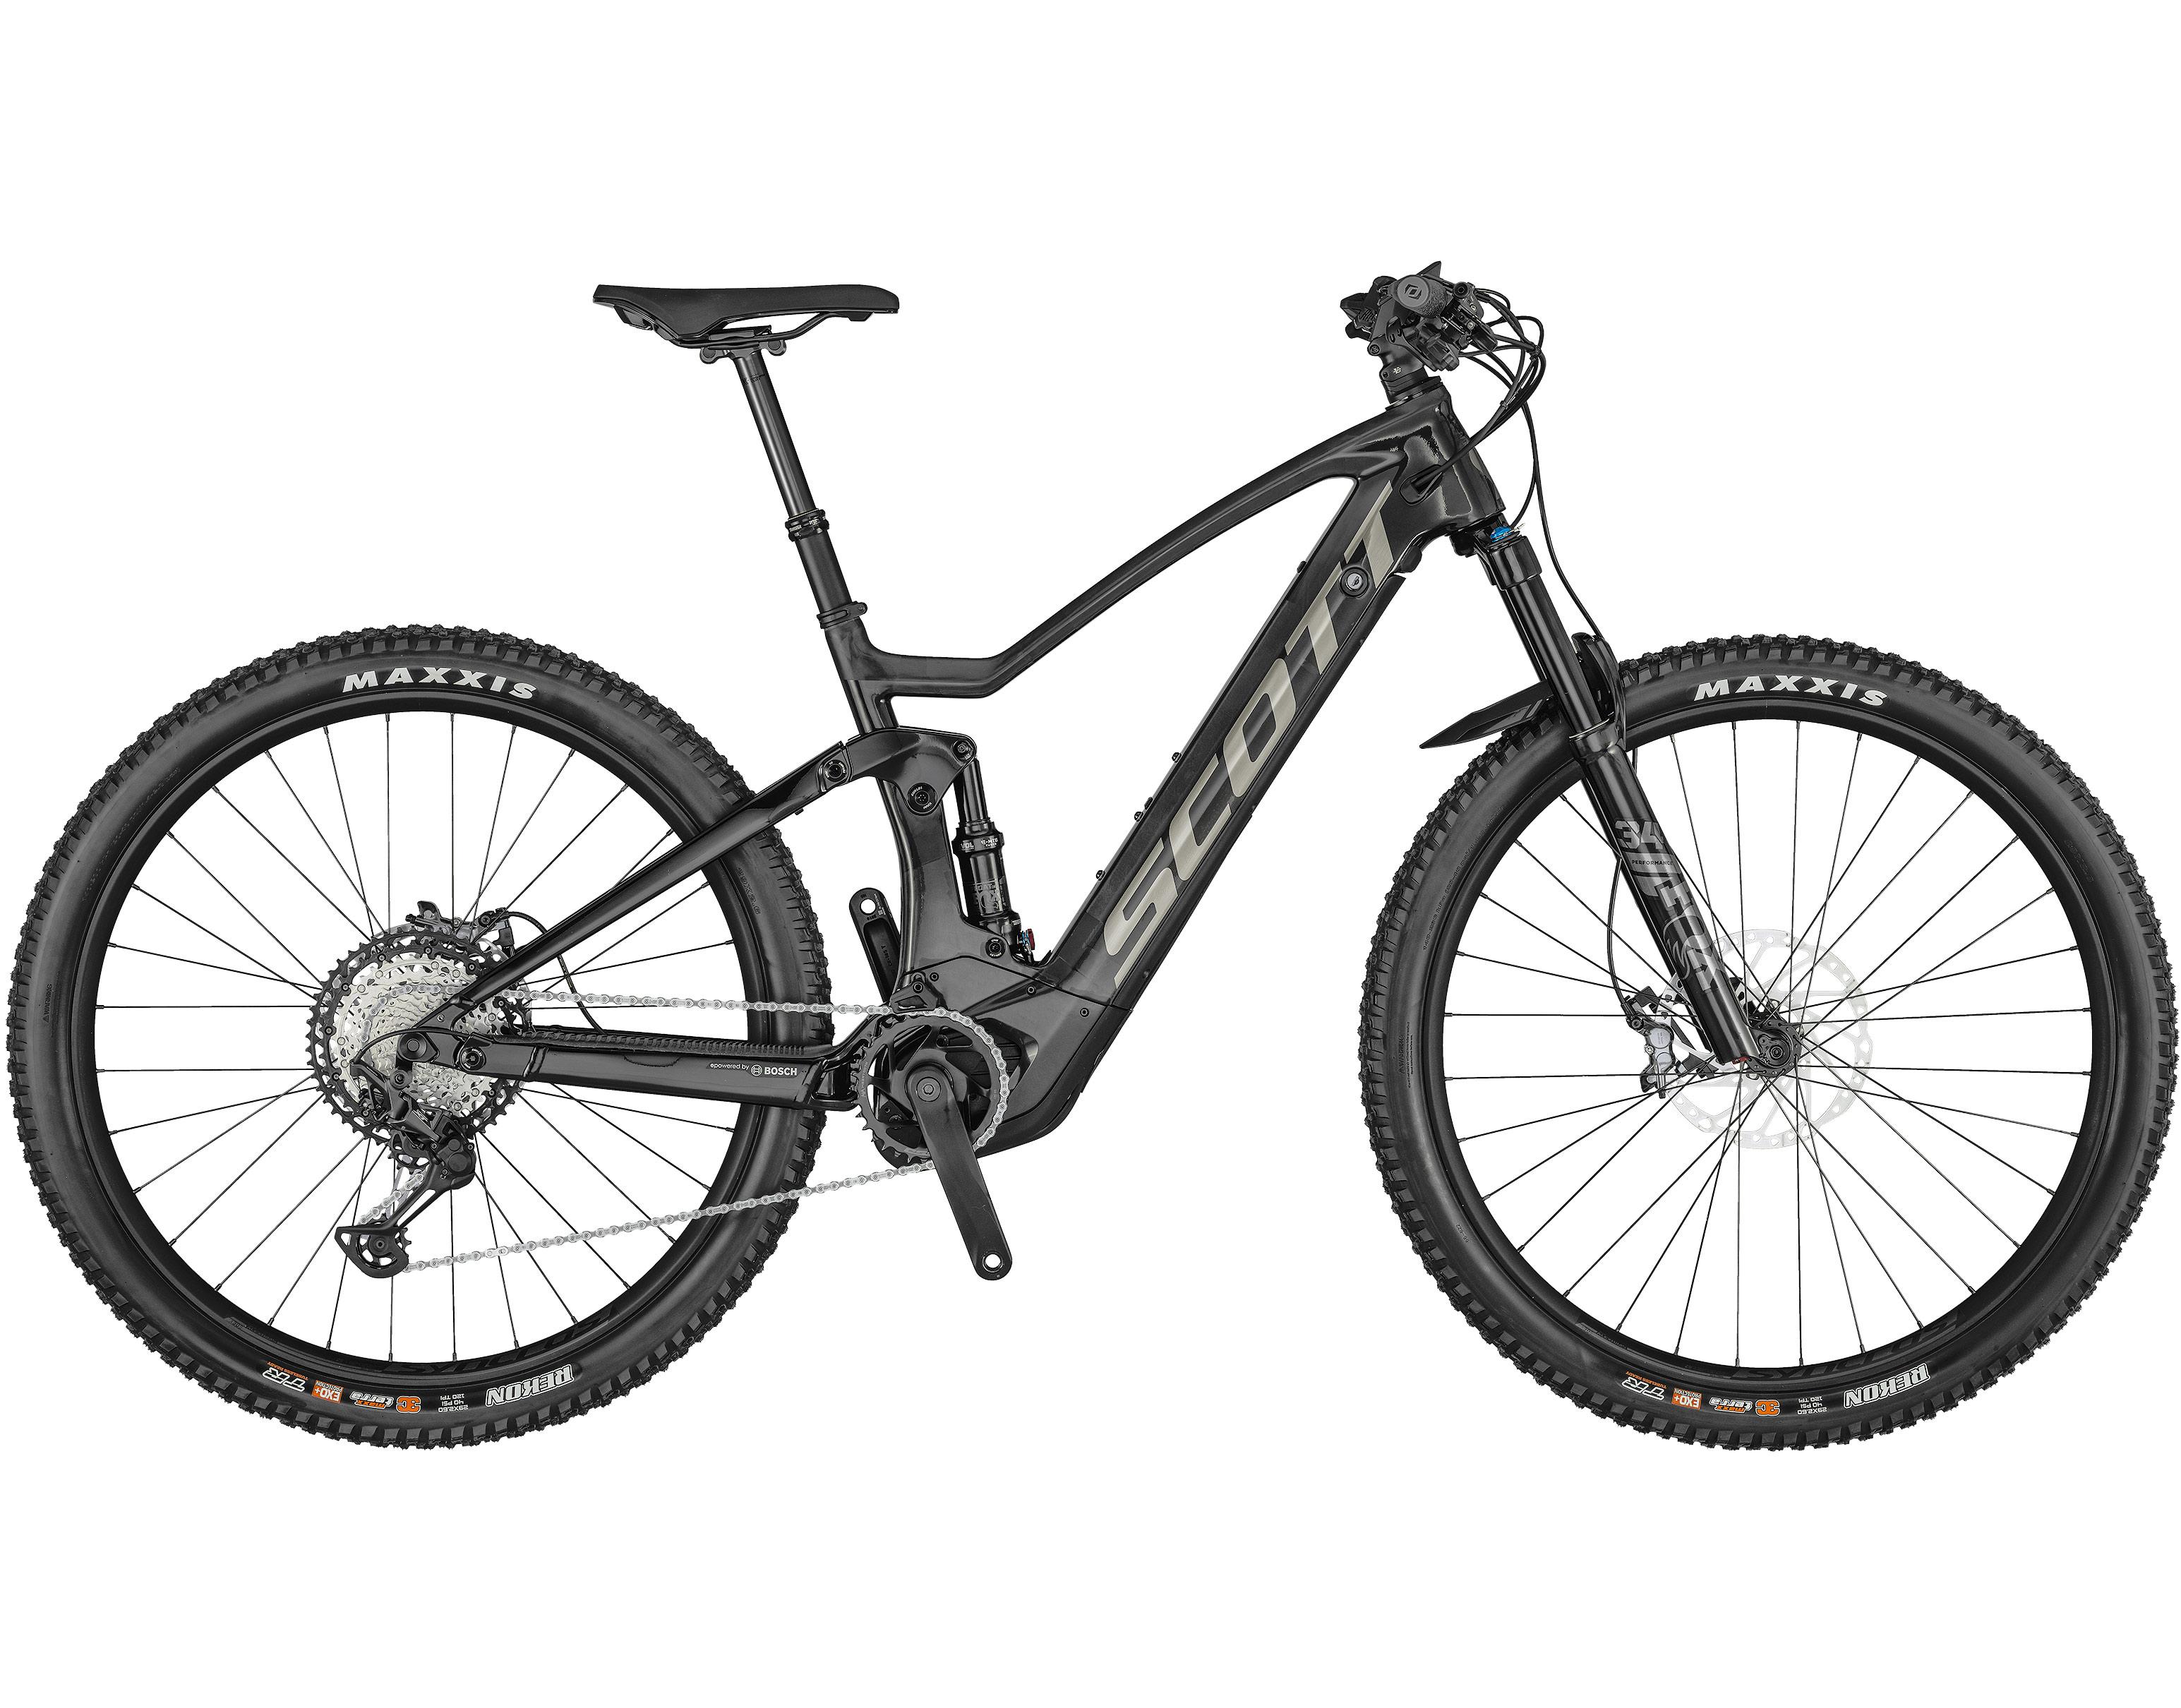 Syncros Grips Comfort Lock On Fahrradgriffe Damen online